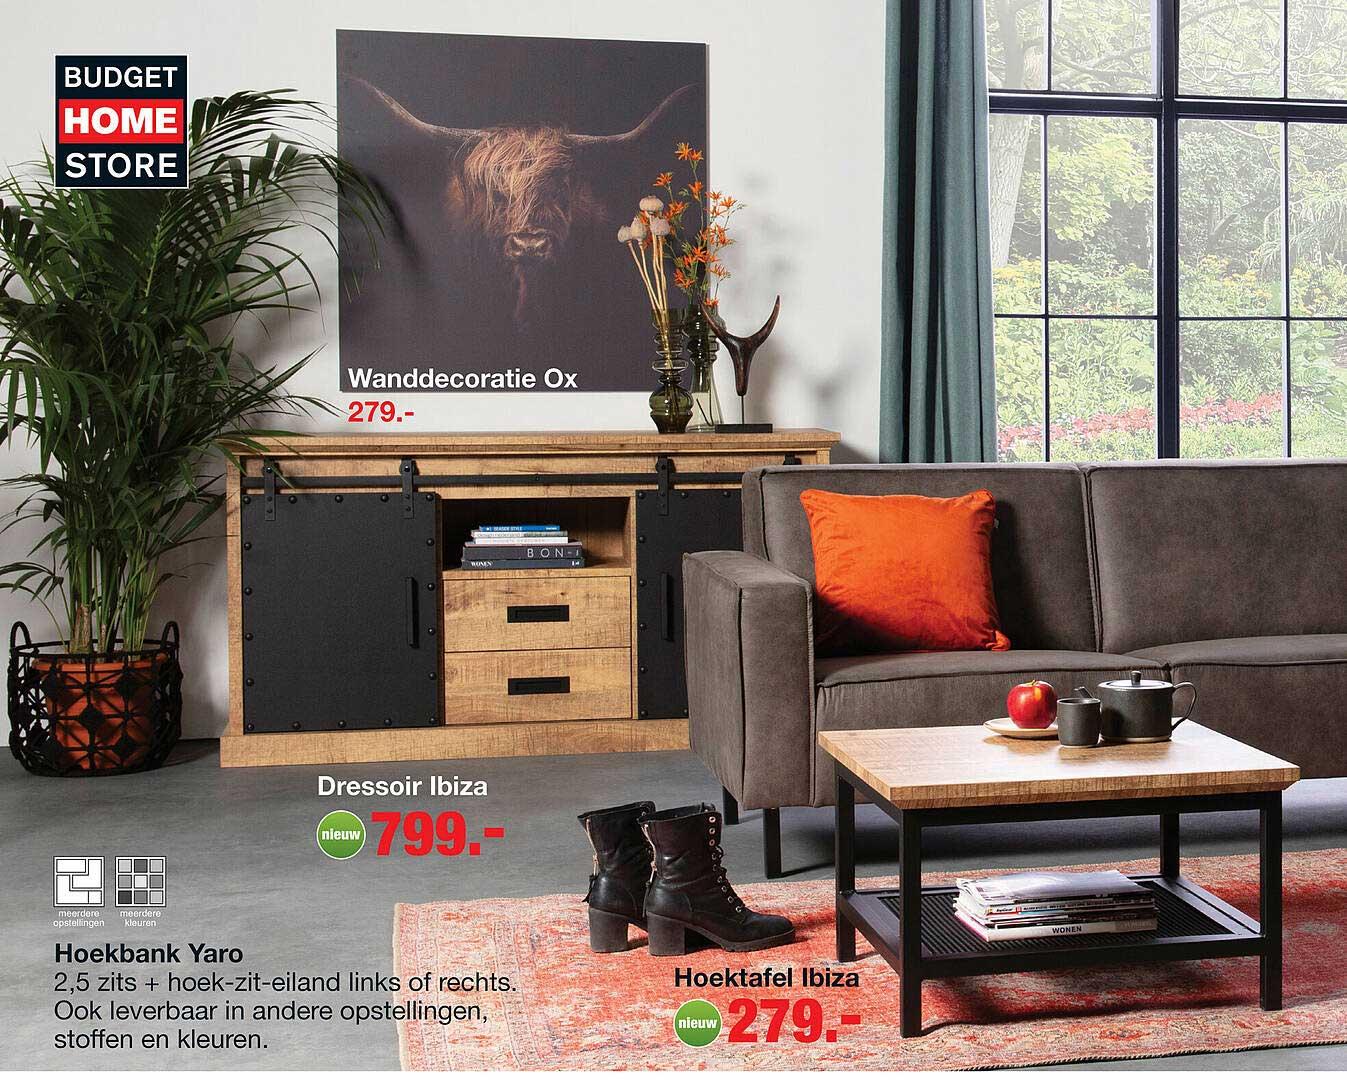 Budget Home Store Wanddecoratie Ox, Dressoir Ibiza, Hoekbank Yaro Of Hoektafel Ibiza